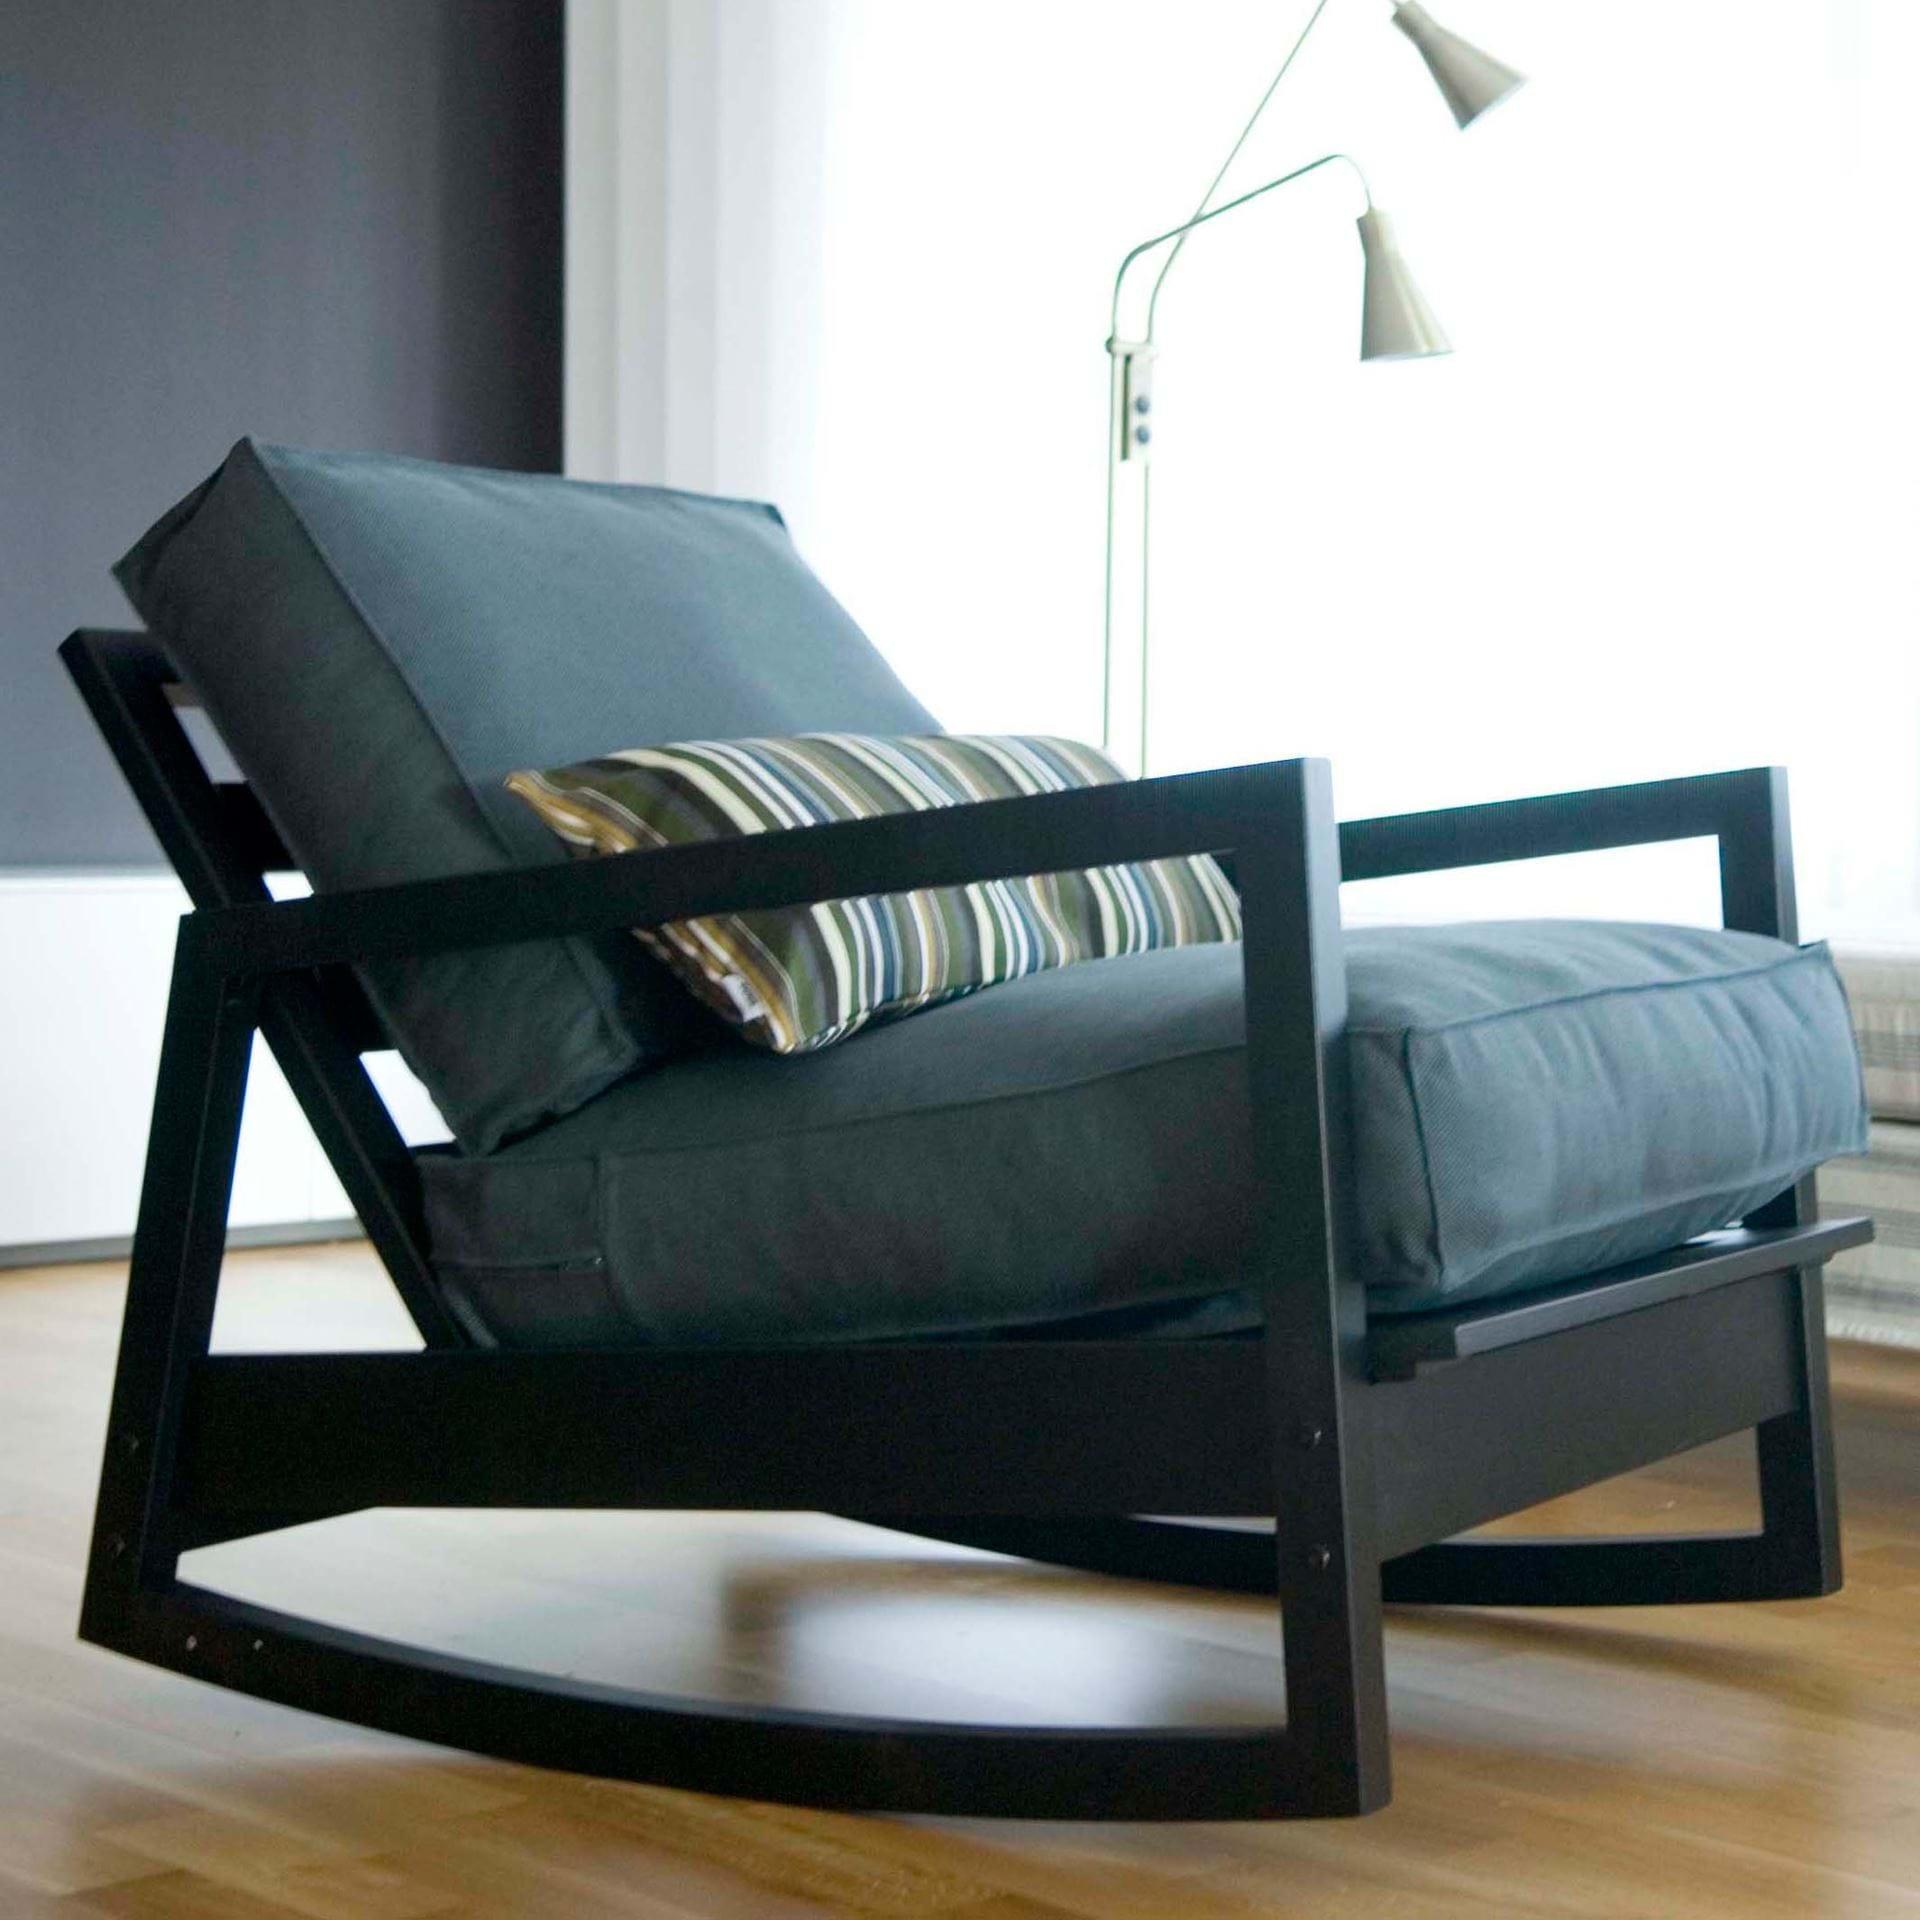 Peachy Ikea Lillberg Rocking Chair Cover Bemz Bemz Theyellowbook Wood Chair Design Ideas Theyellowbookinfo